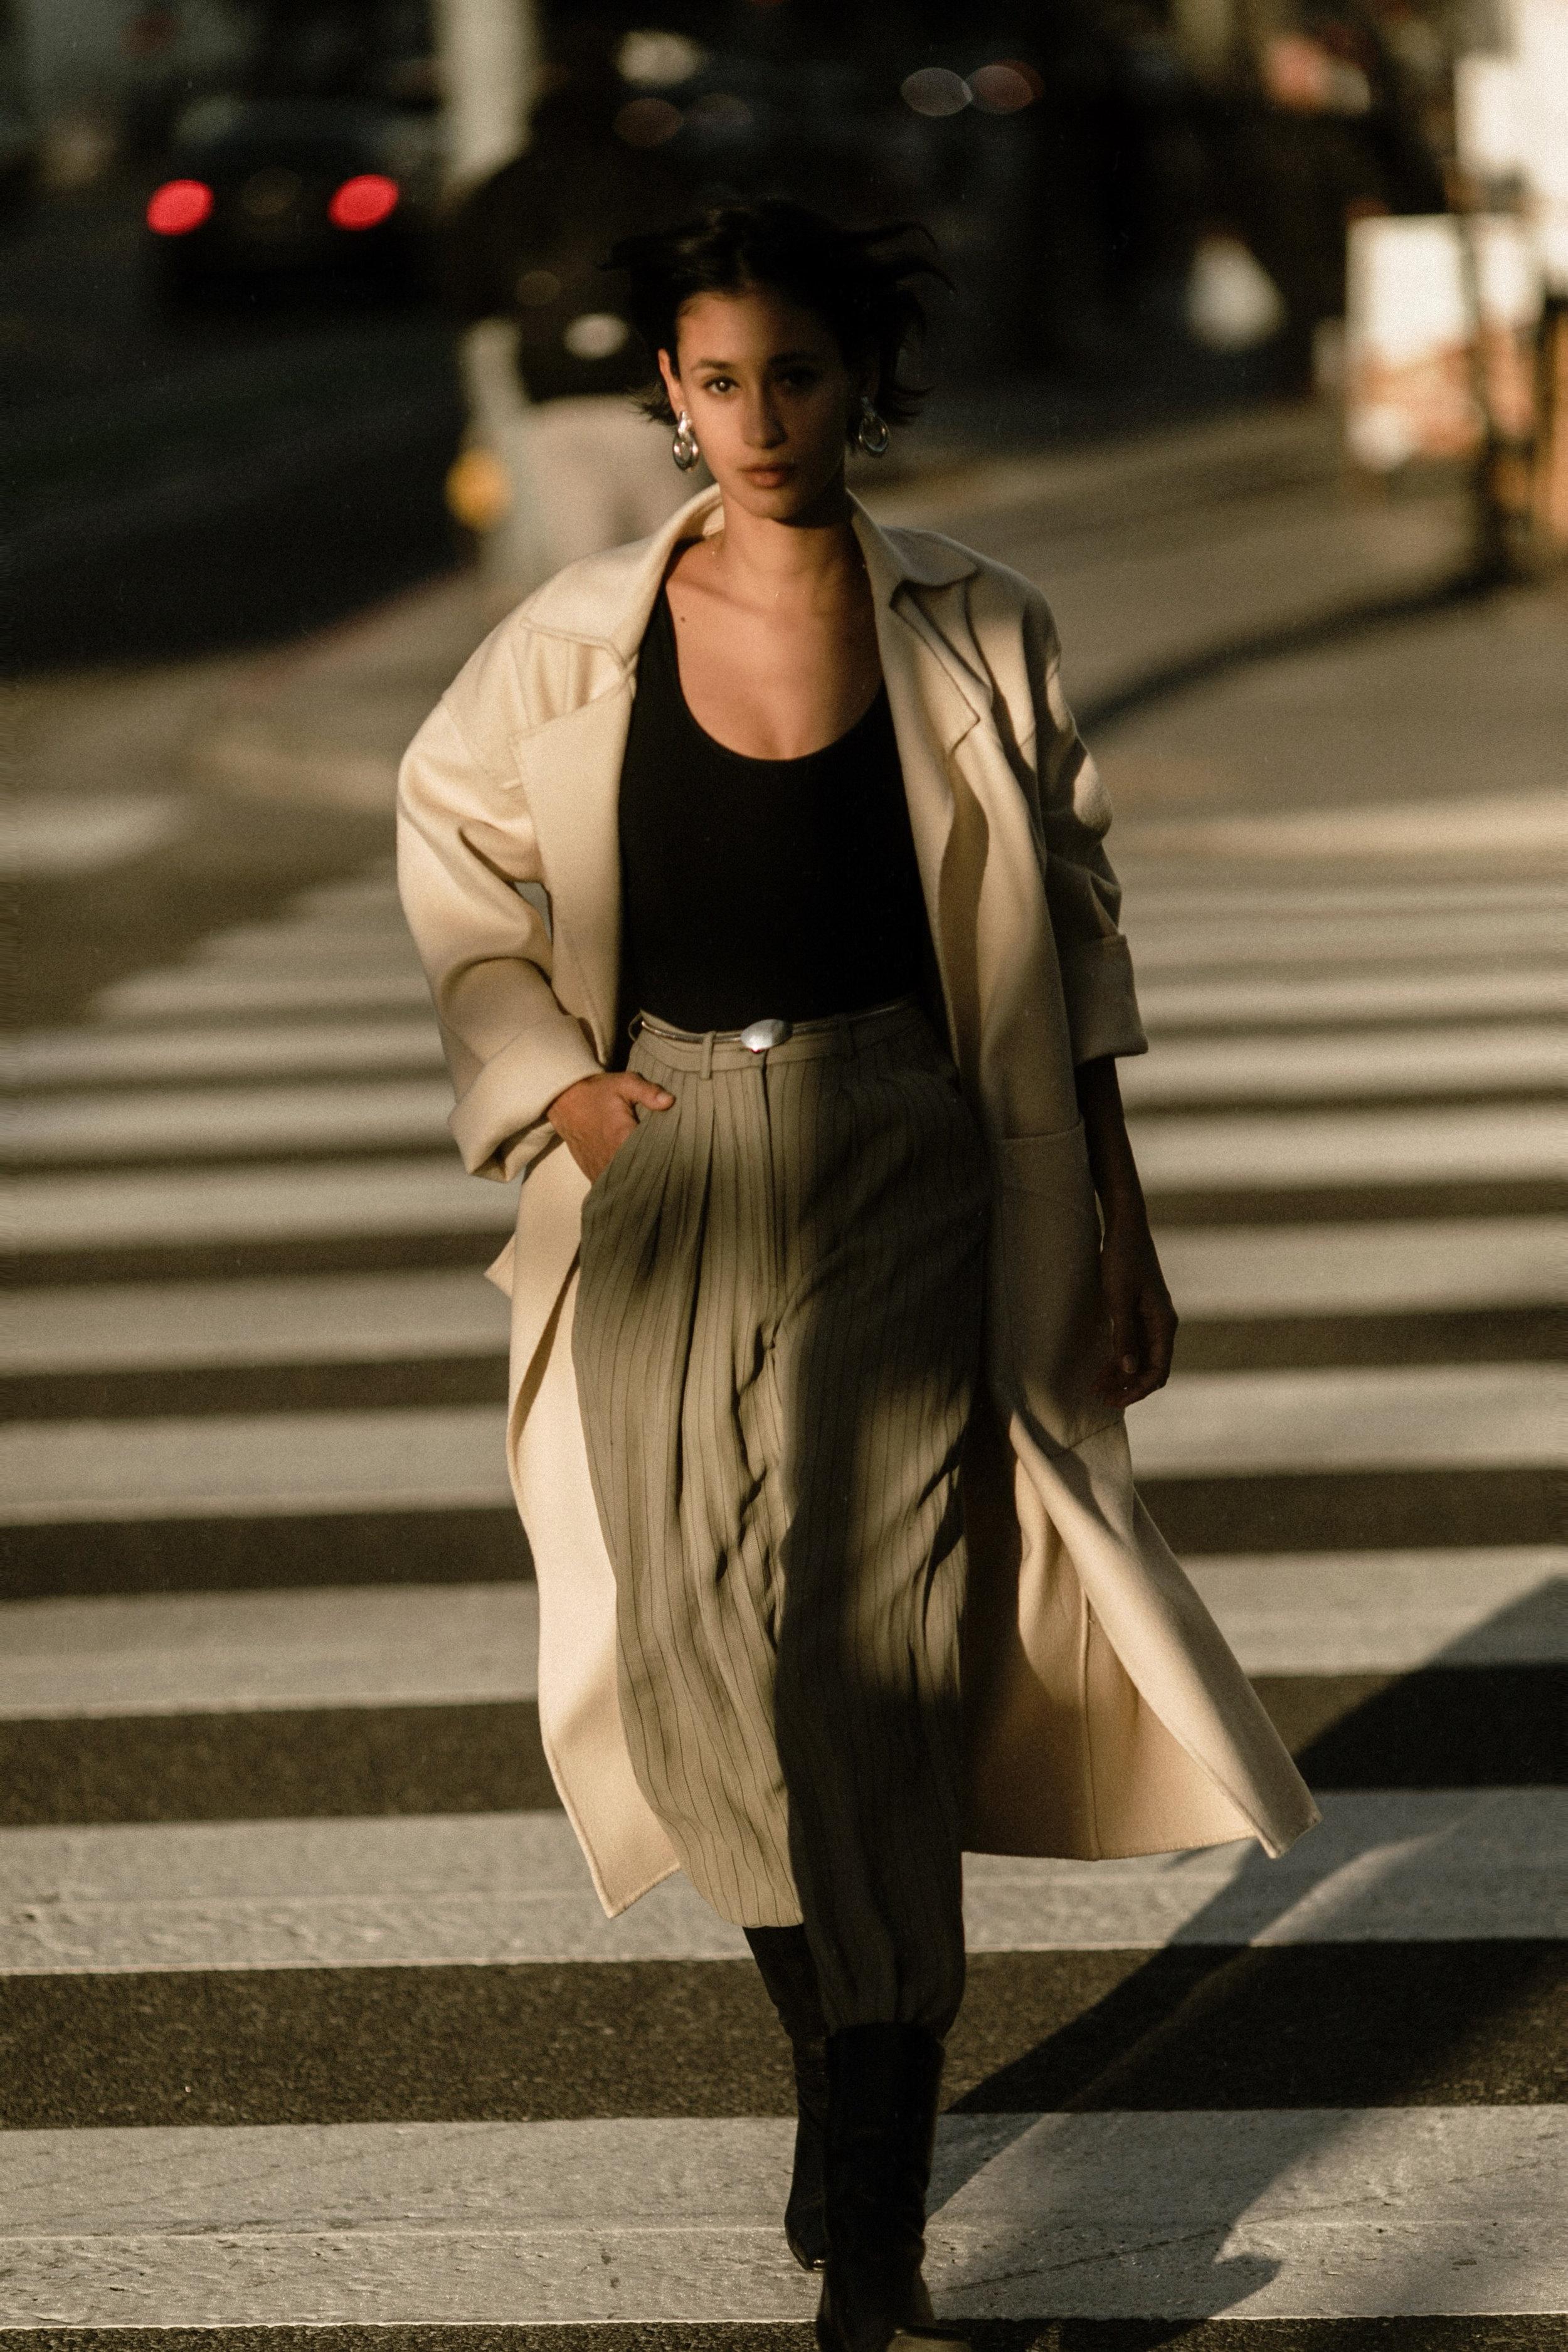 Los Angeles Fashion on the Street